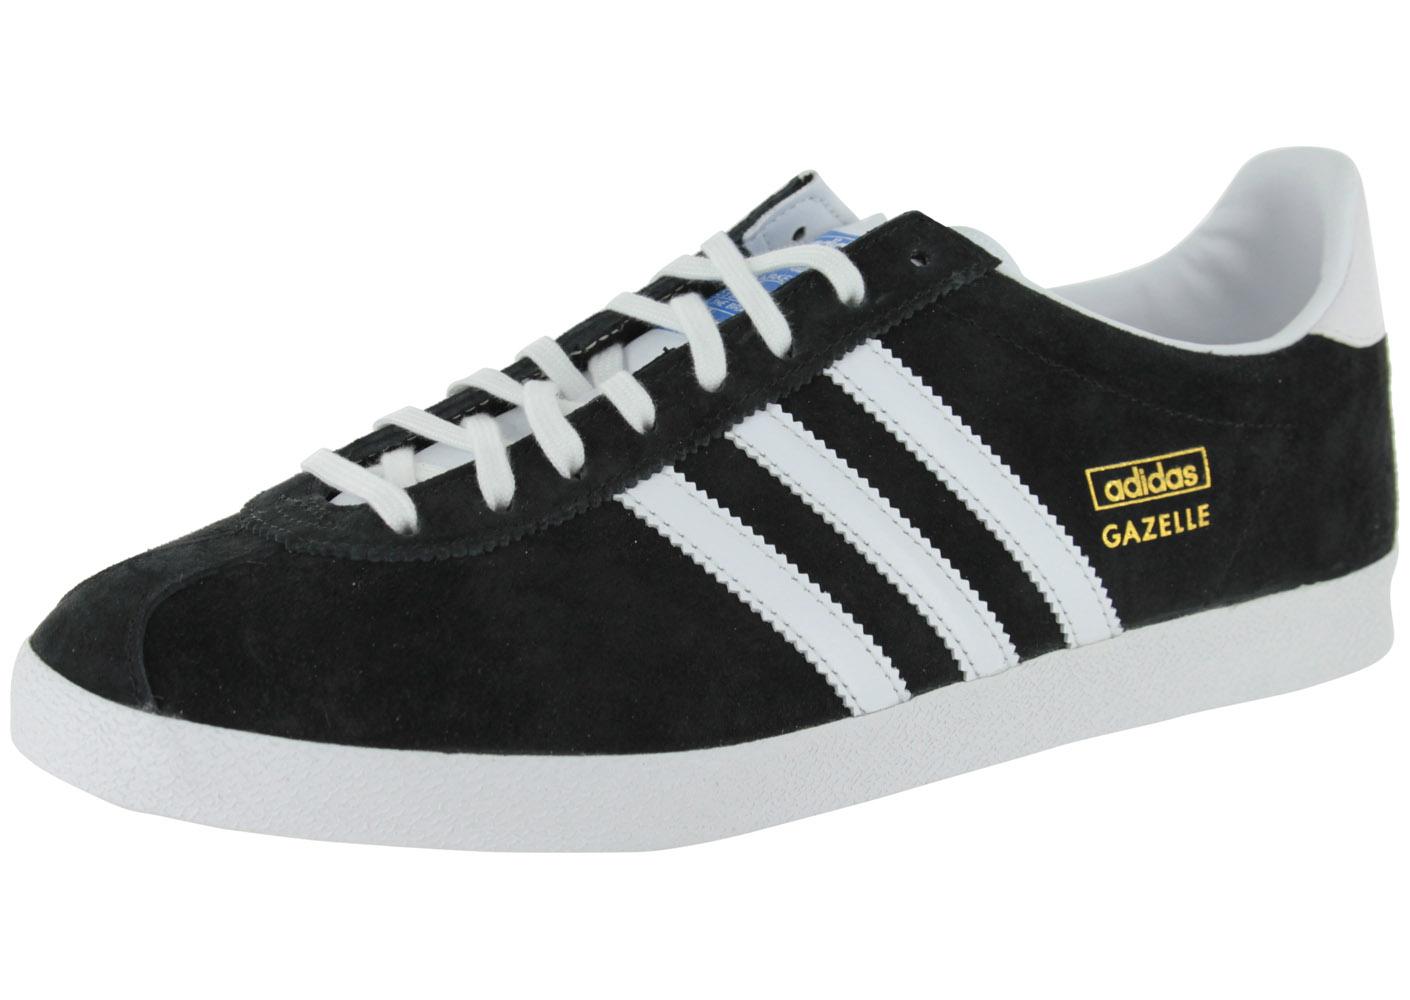 chaussures adidas gazelle homme